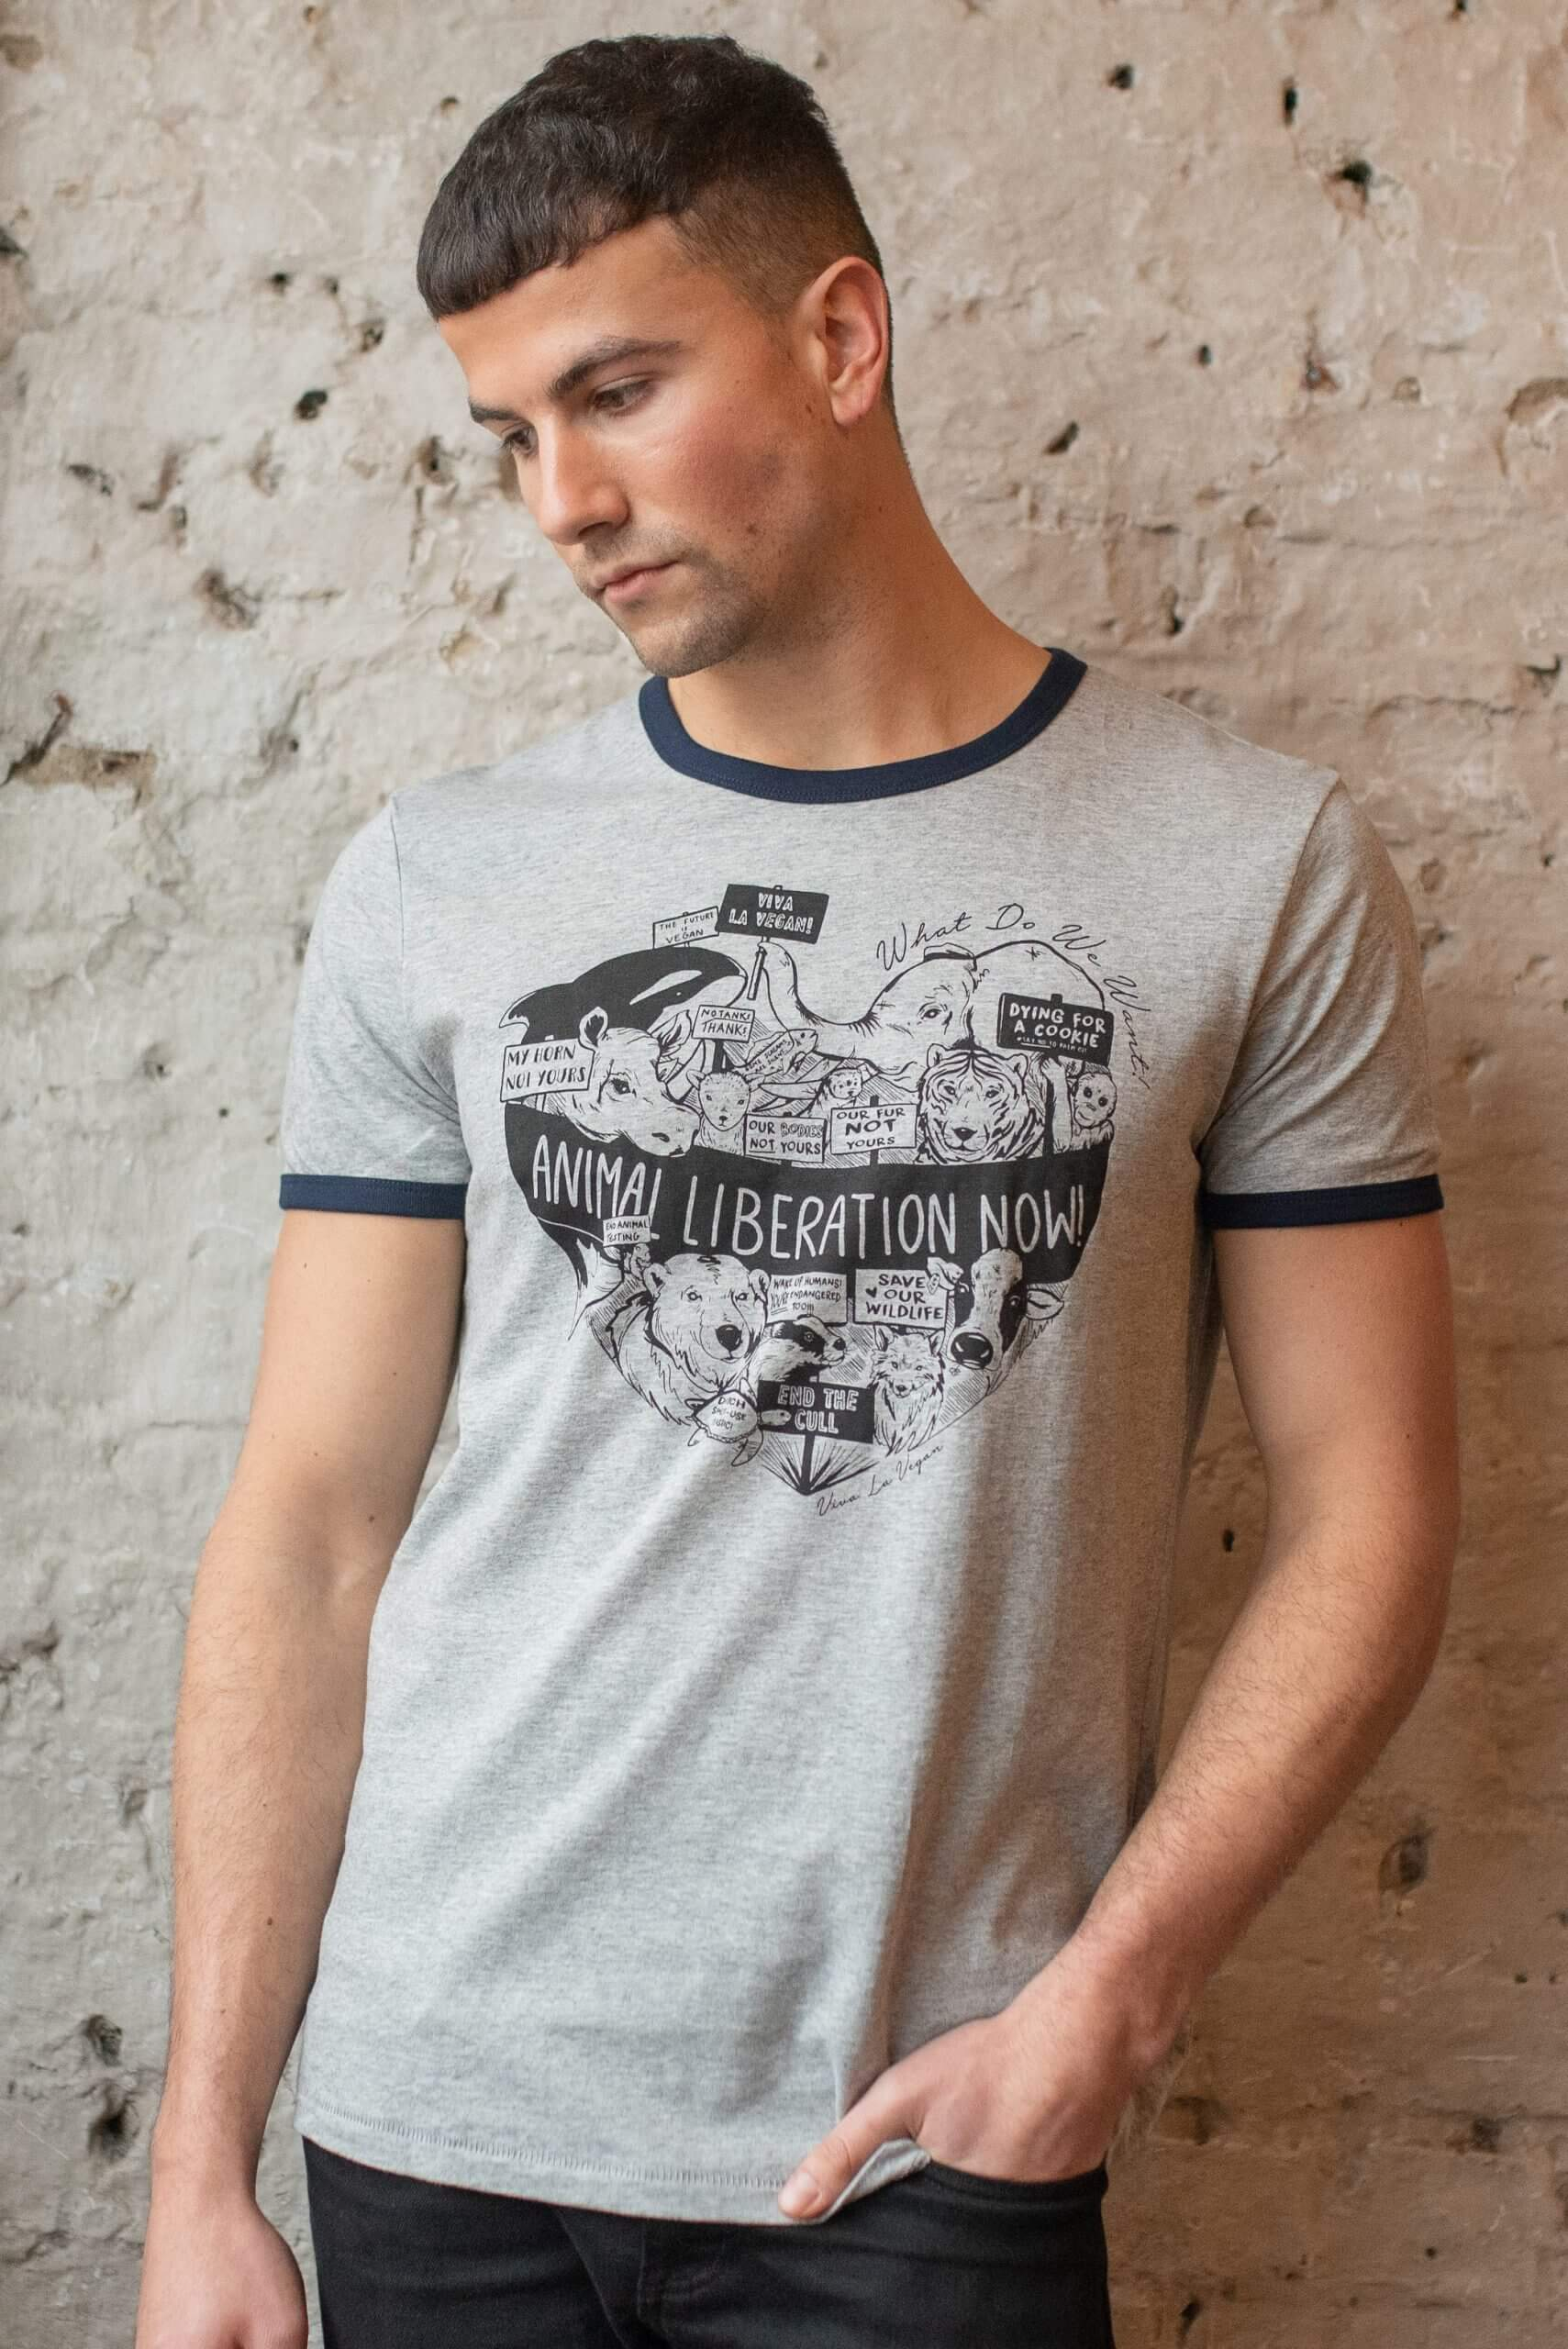 male model wearing unisex style animal liberation designed t shirt